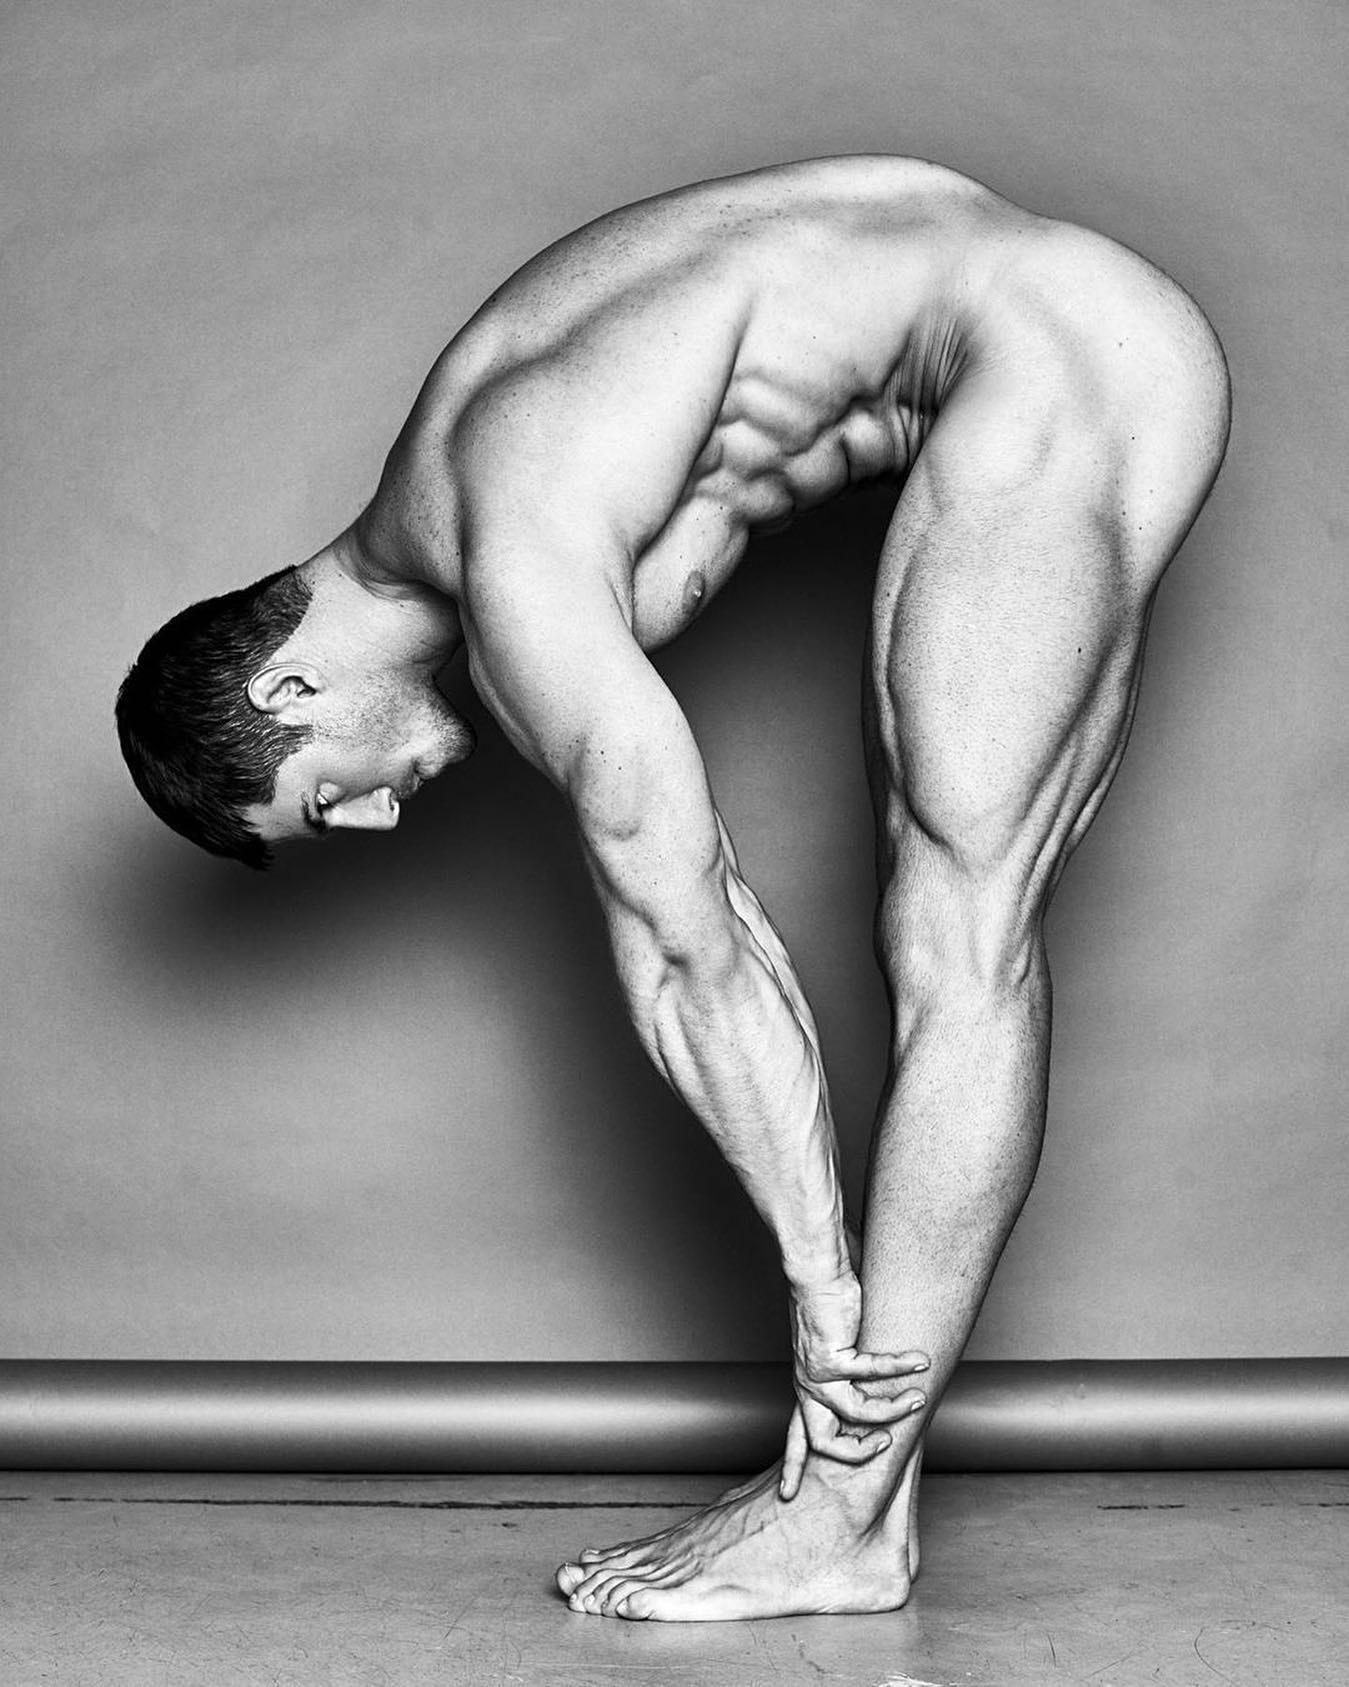 #men #muscle #blackandwhite #hotmen